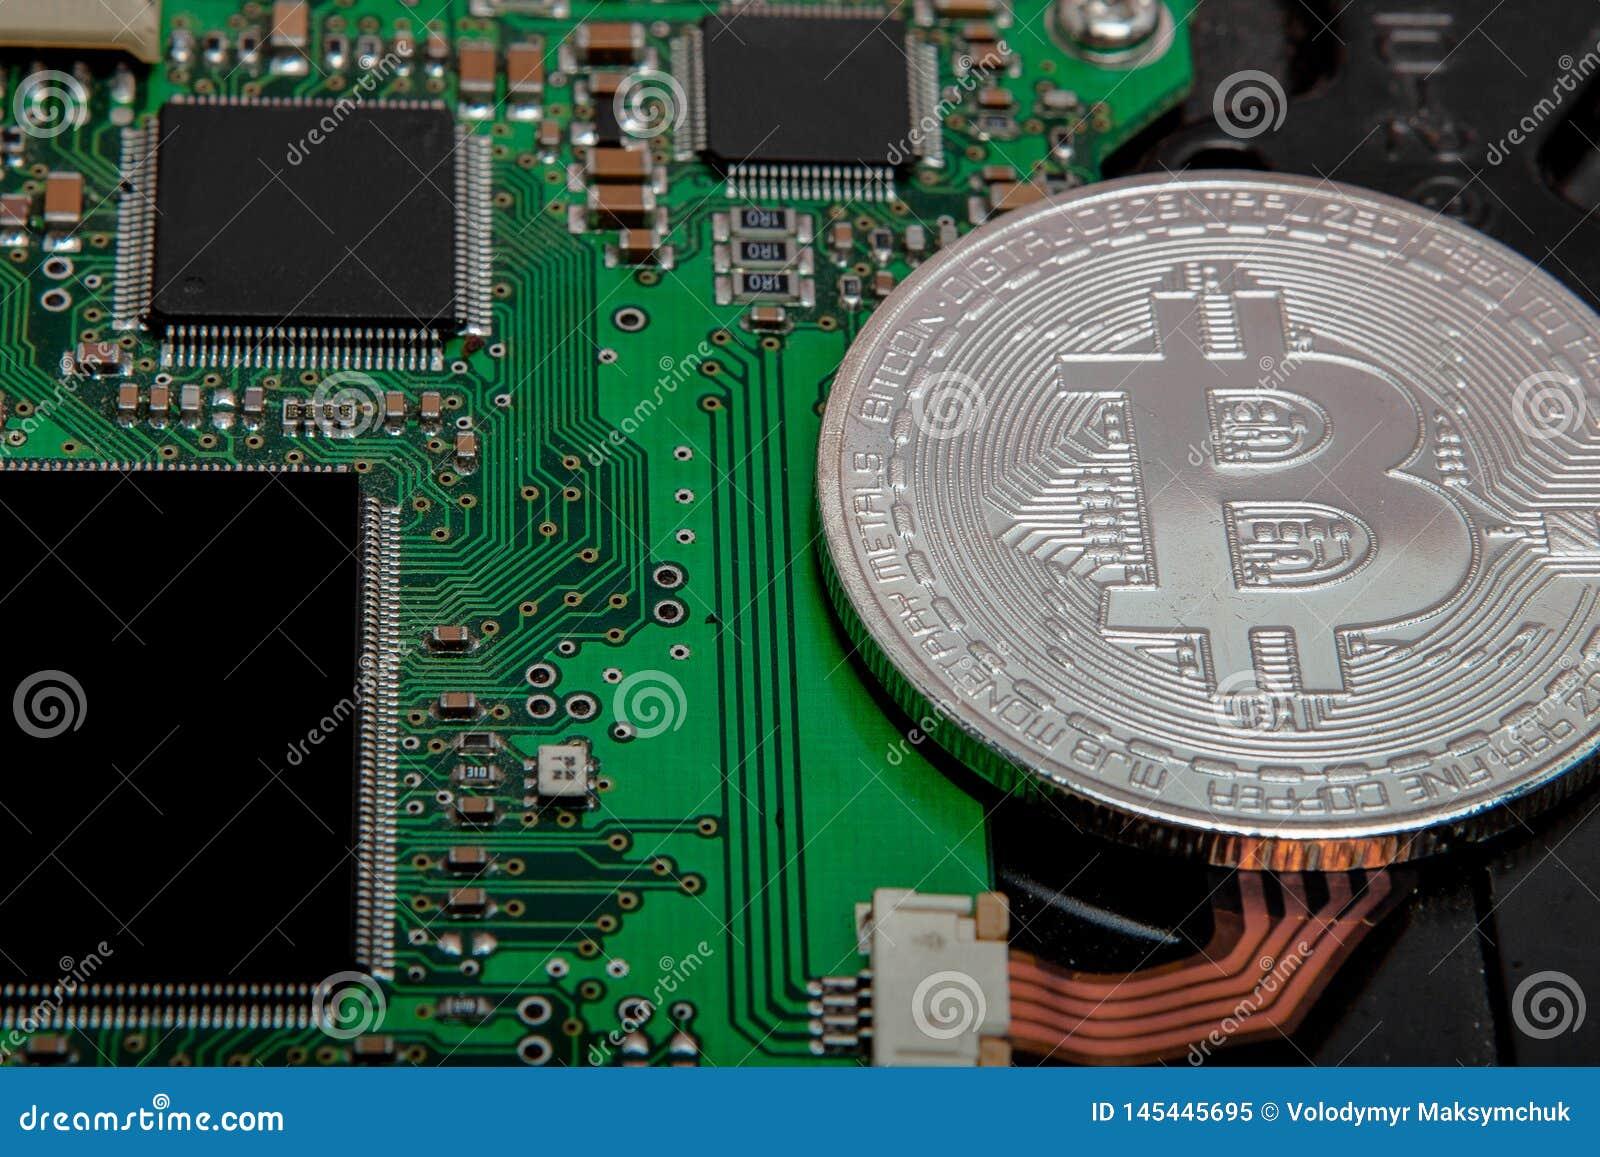 X8632 bitcoins laura go betting